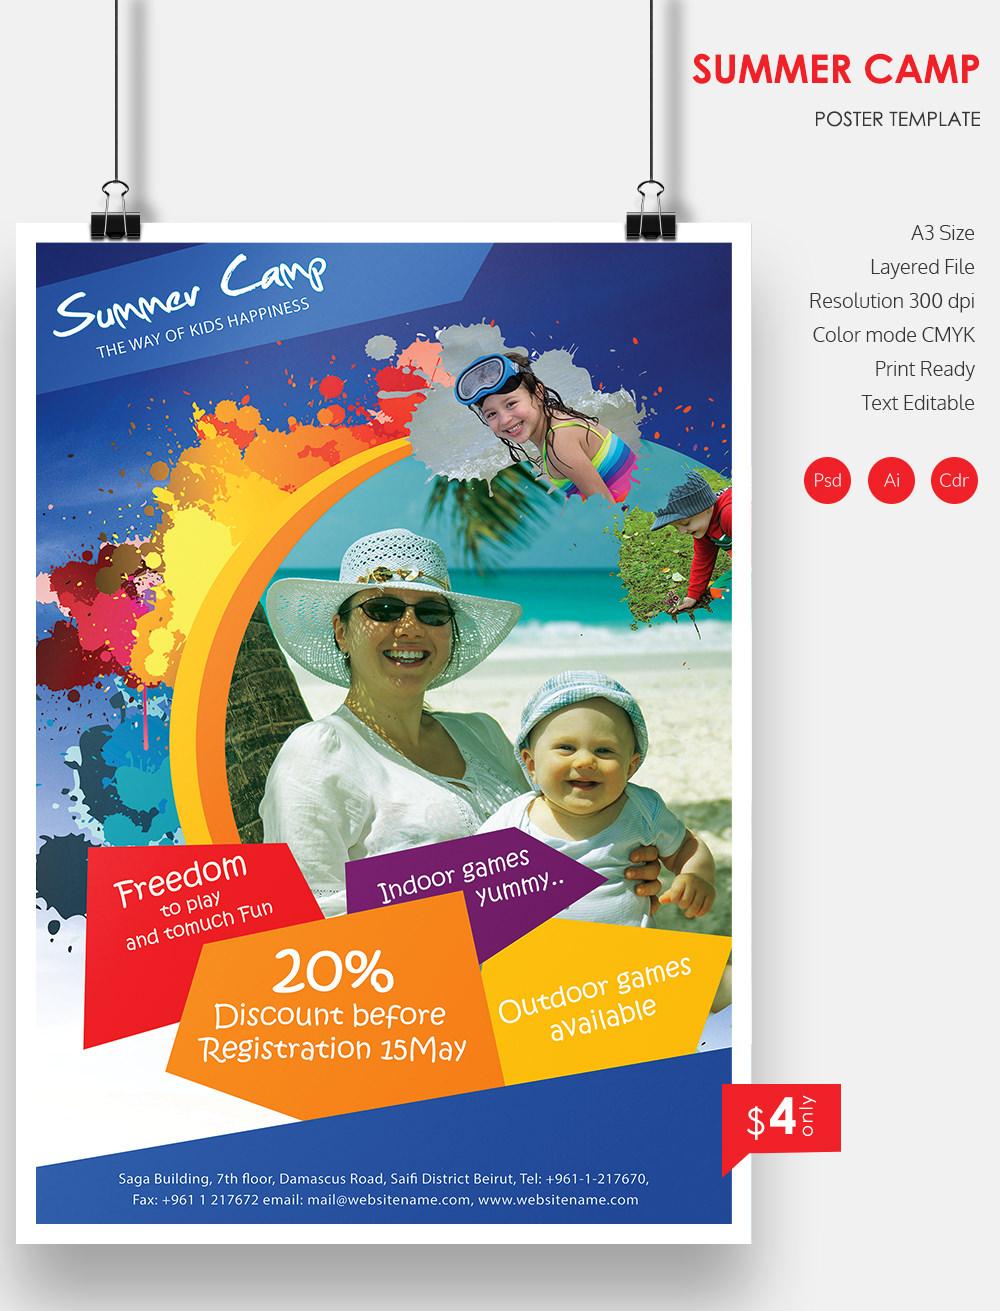 summercamp_poster